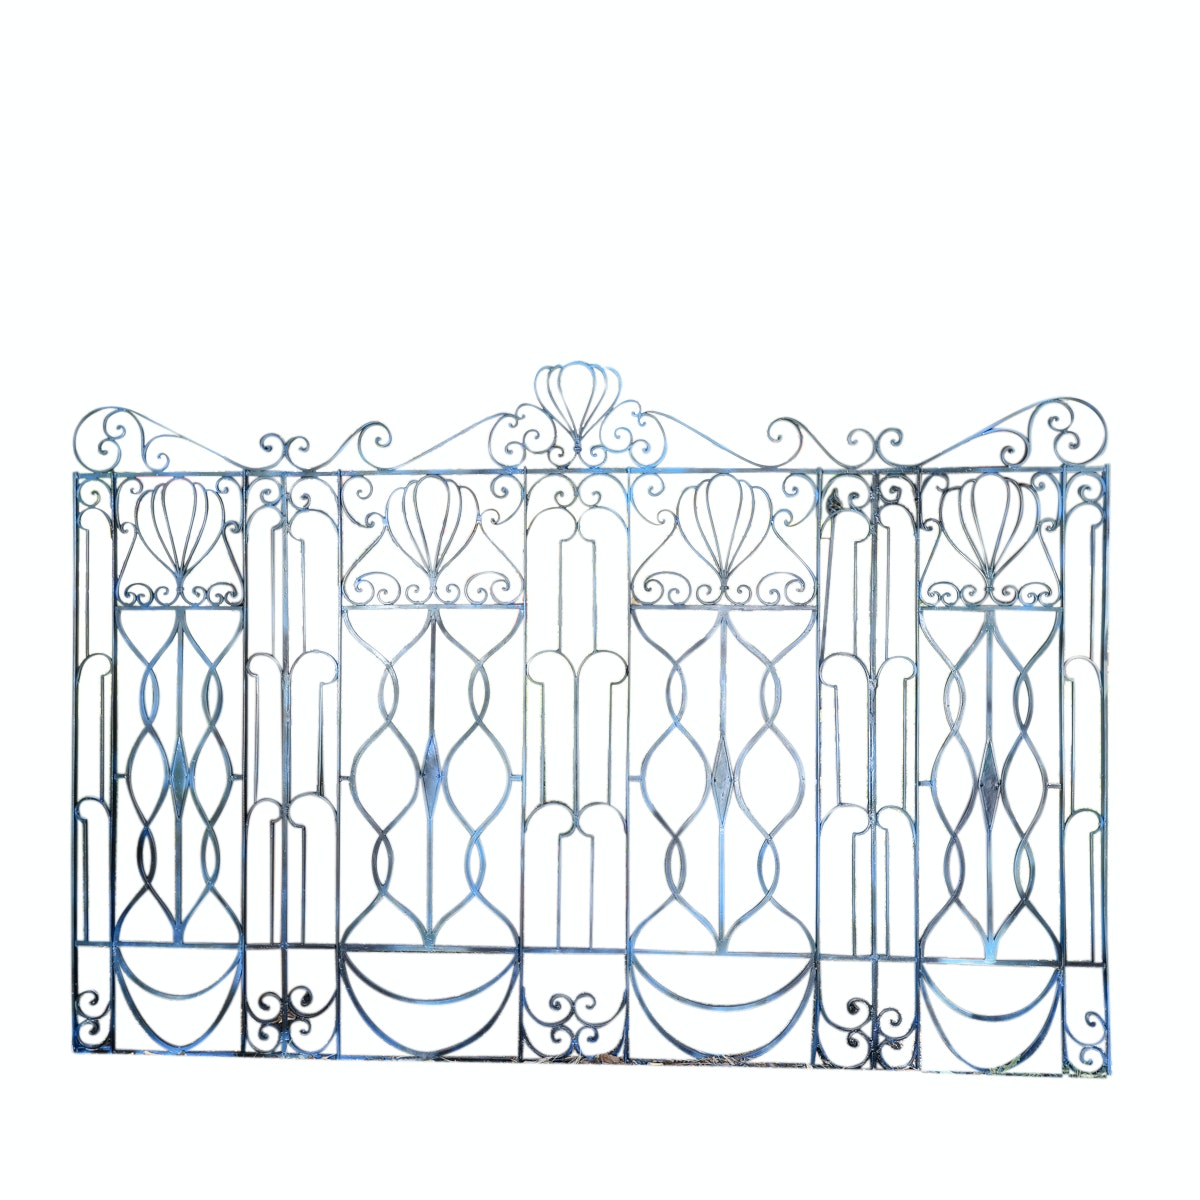 Vintage Inspired Verdigris-Tone Iron Gate